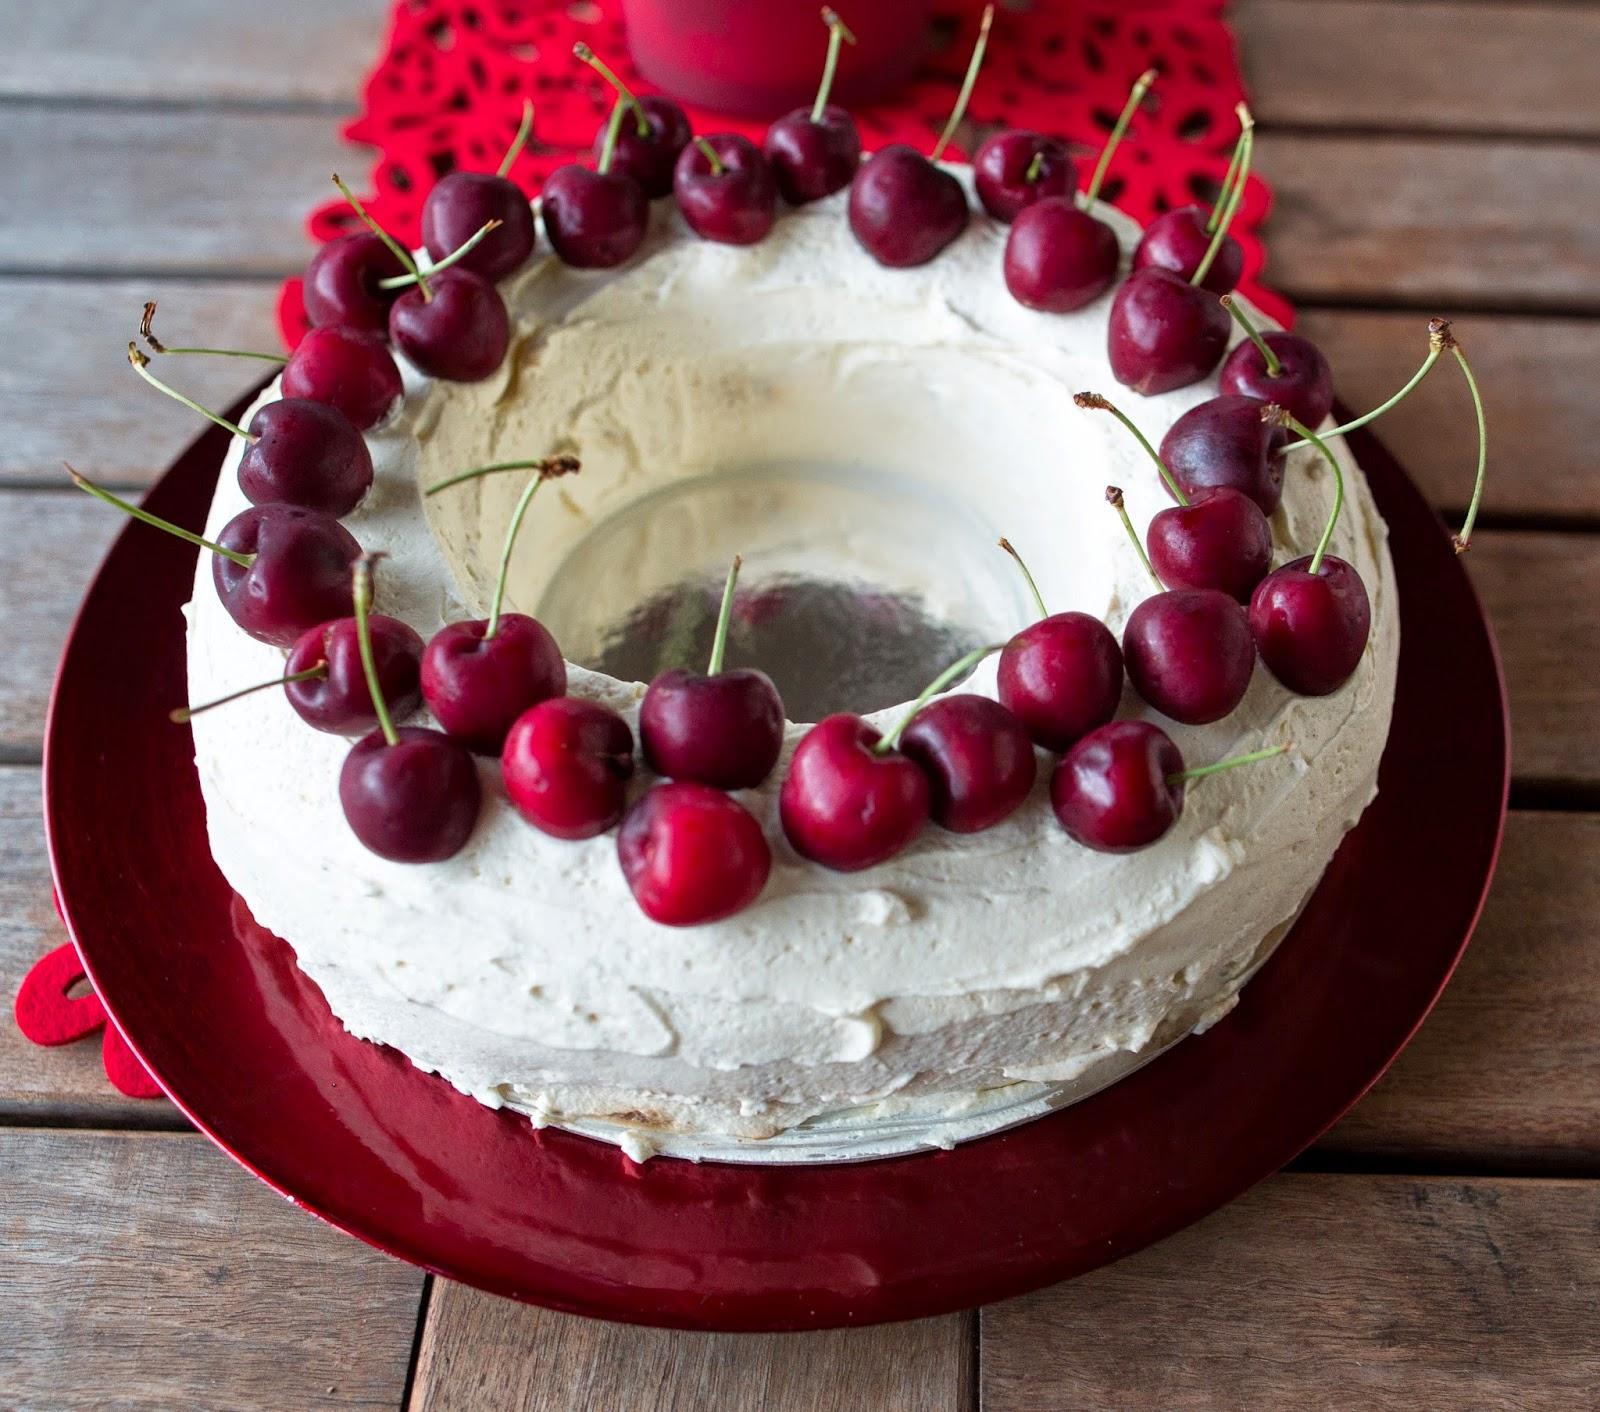 Decorating Chocolate Ripple Cake